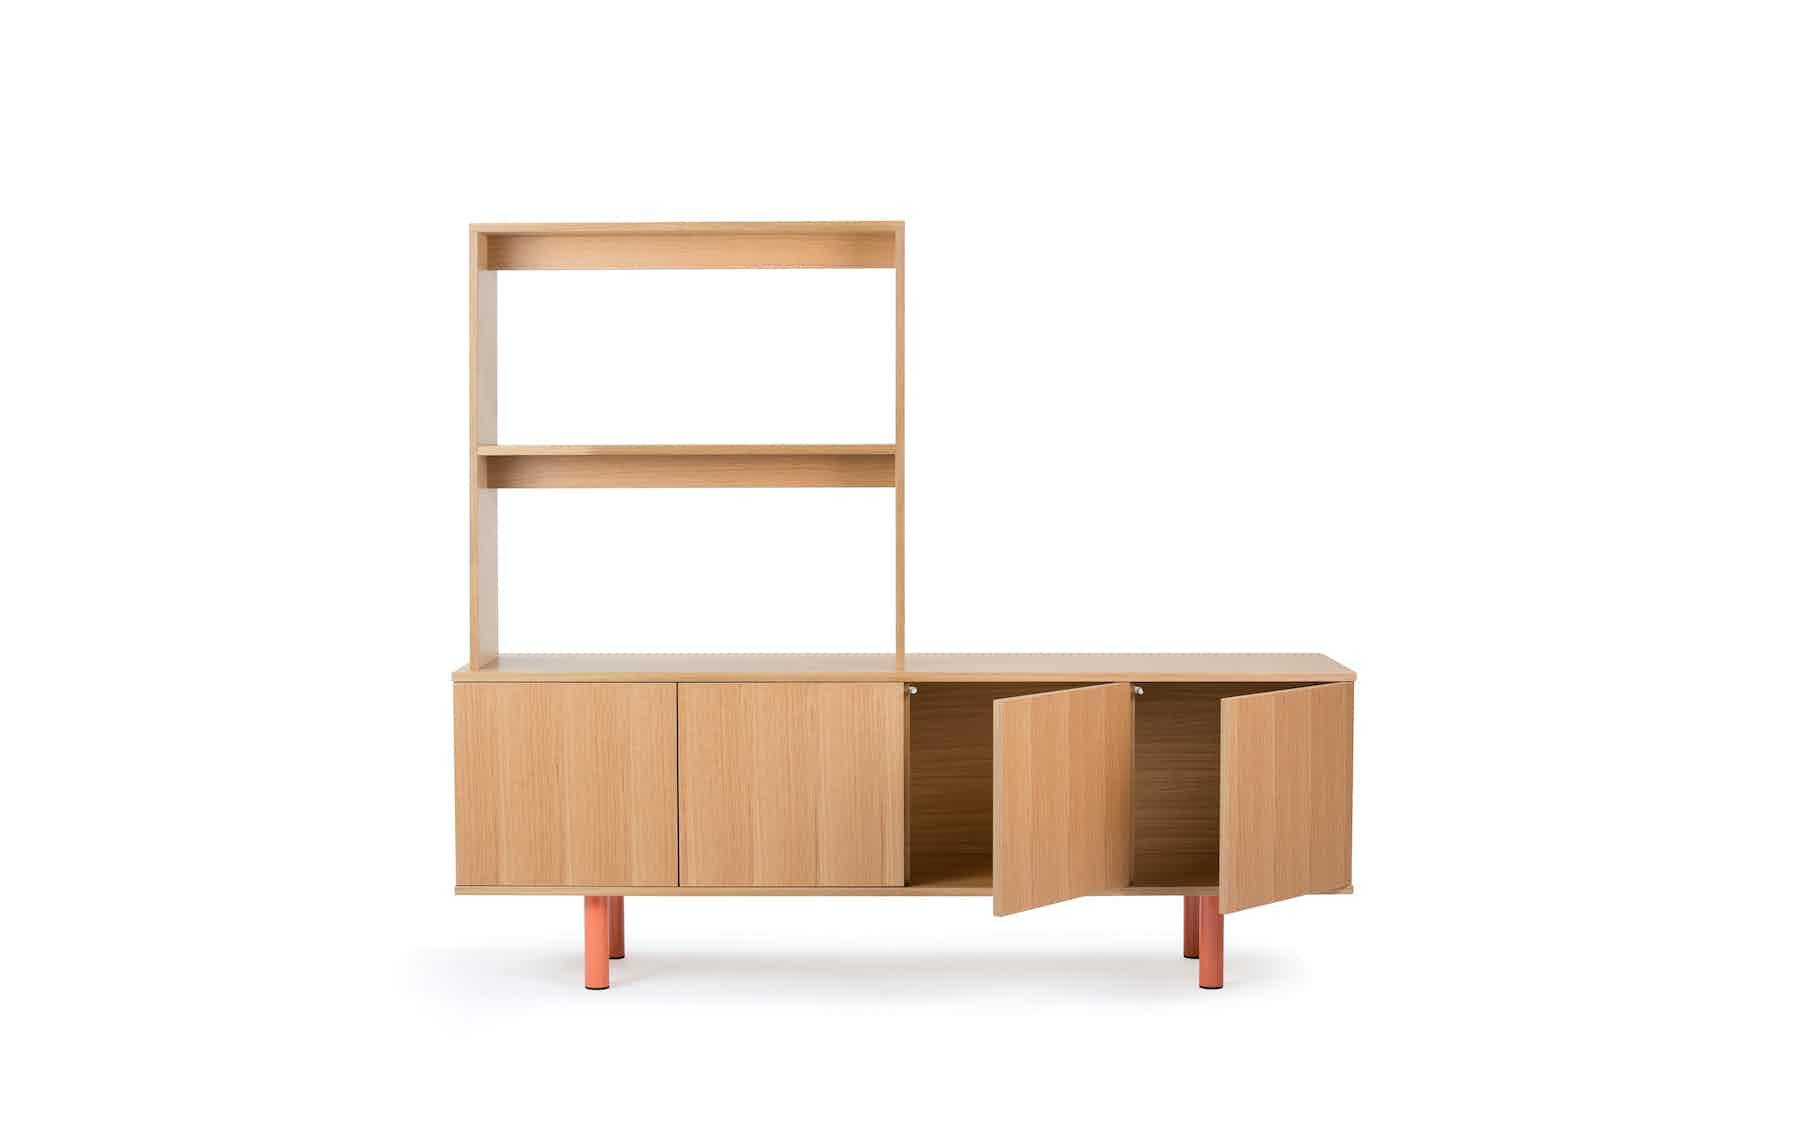 Deadgood-plex-2.0-with-two-high-shelves-haute-living